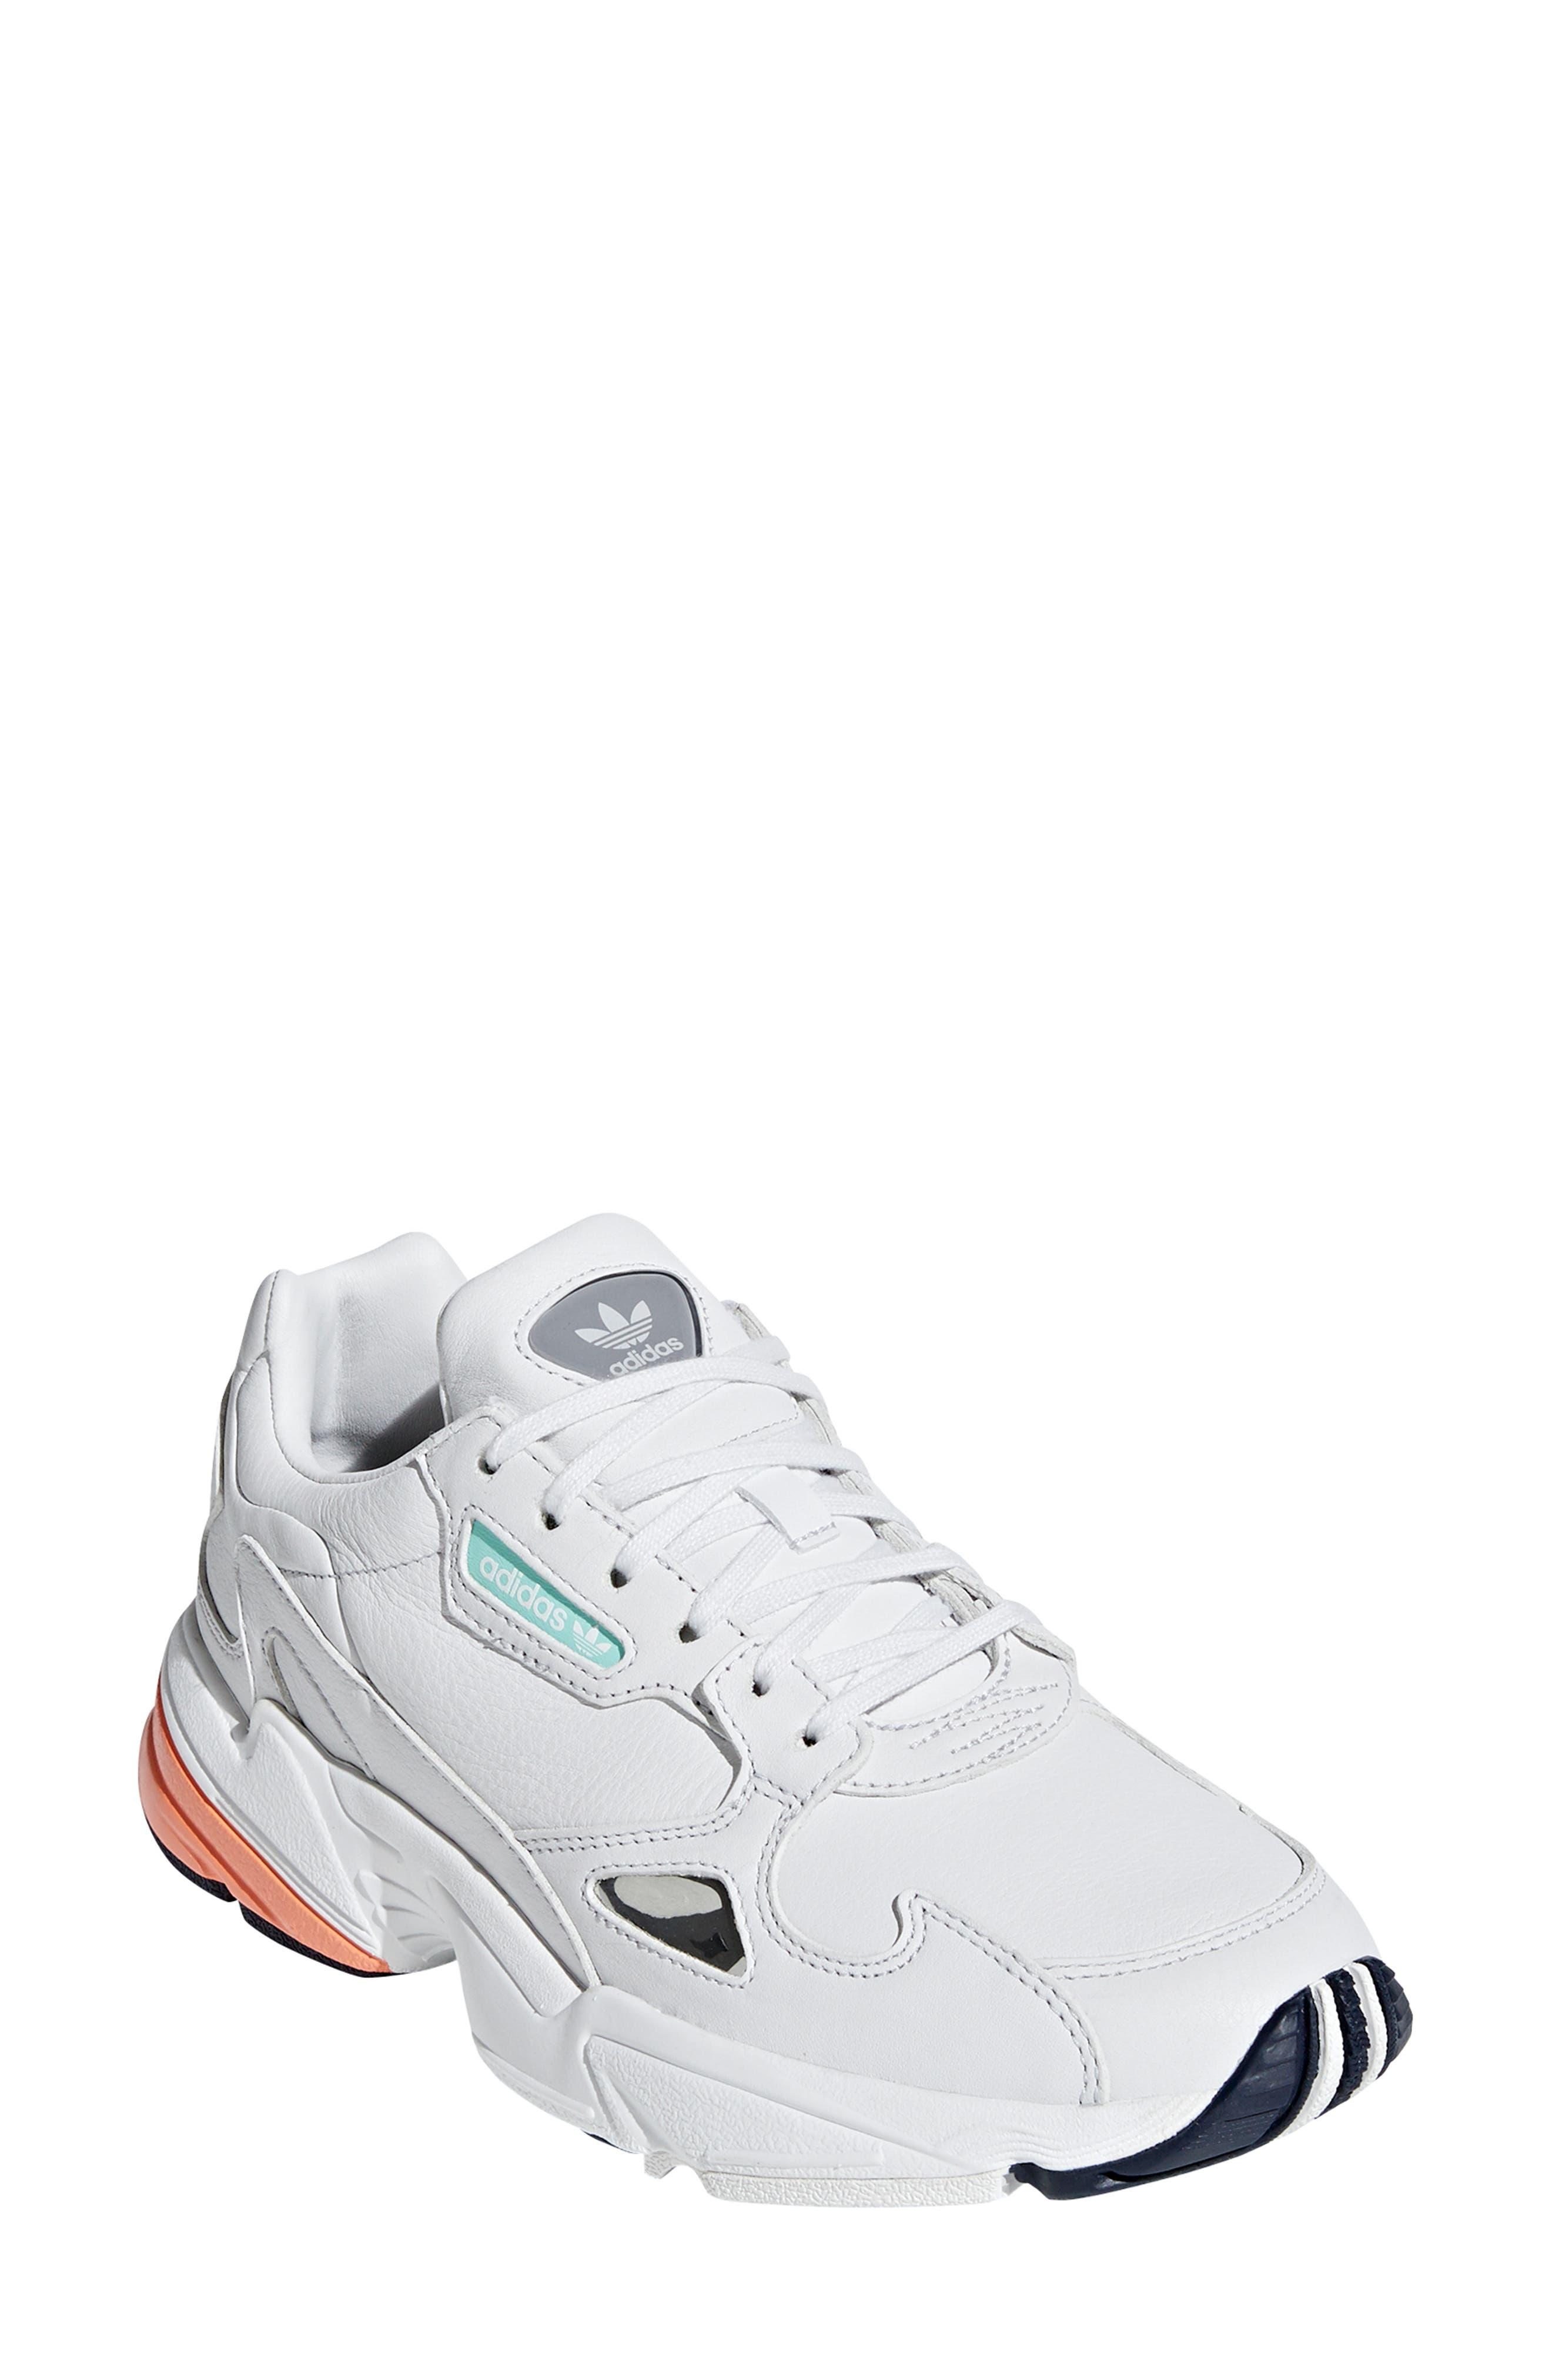 Falcon Sneaker,                             Main thumbnail 1, color,                             CRYSTAL WHITE/ EASY ORANGE